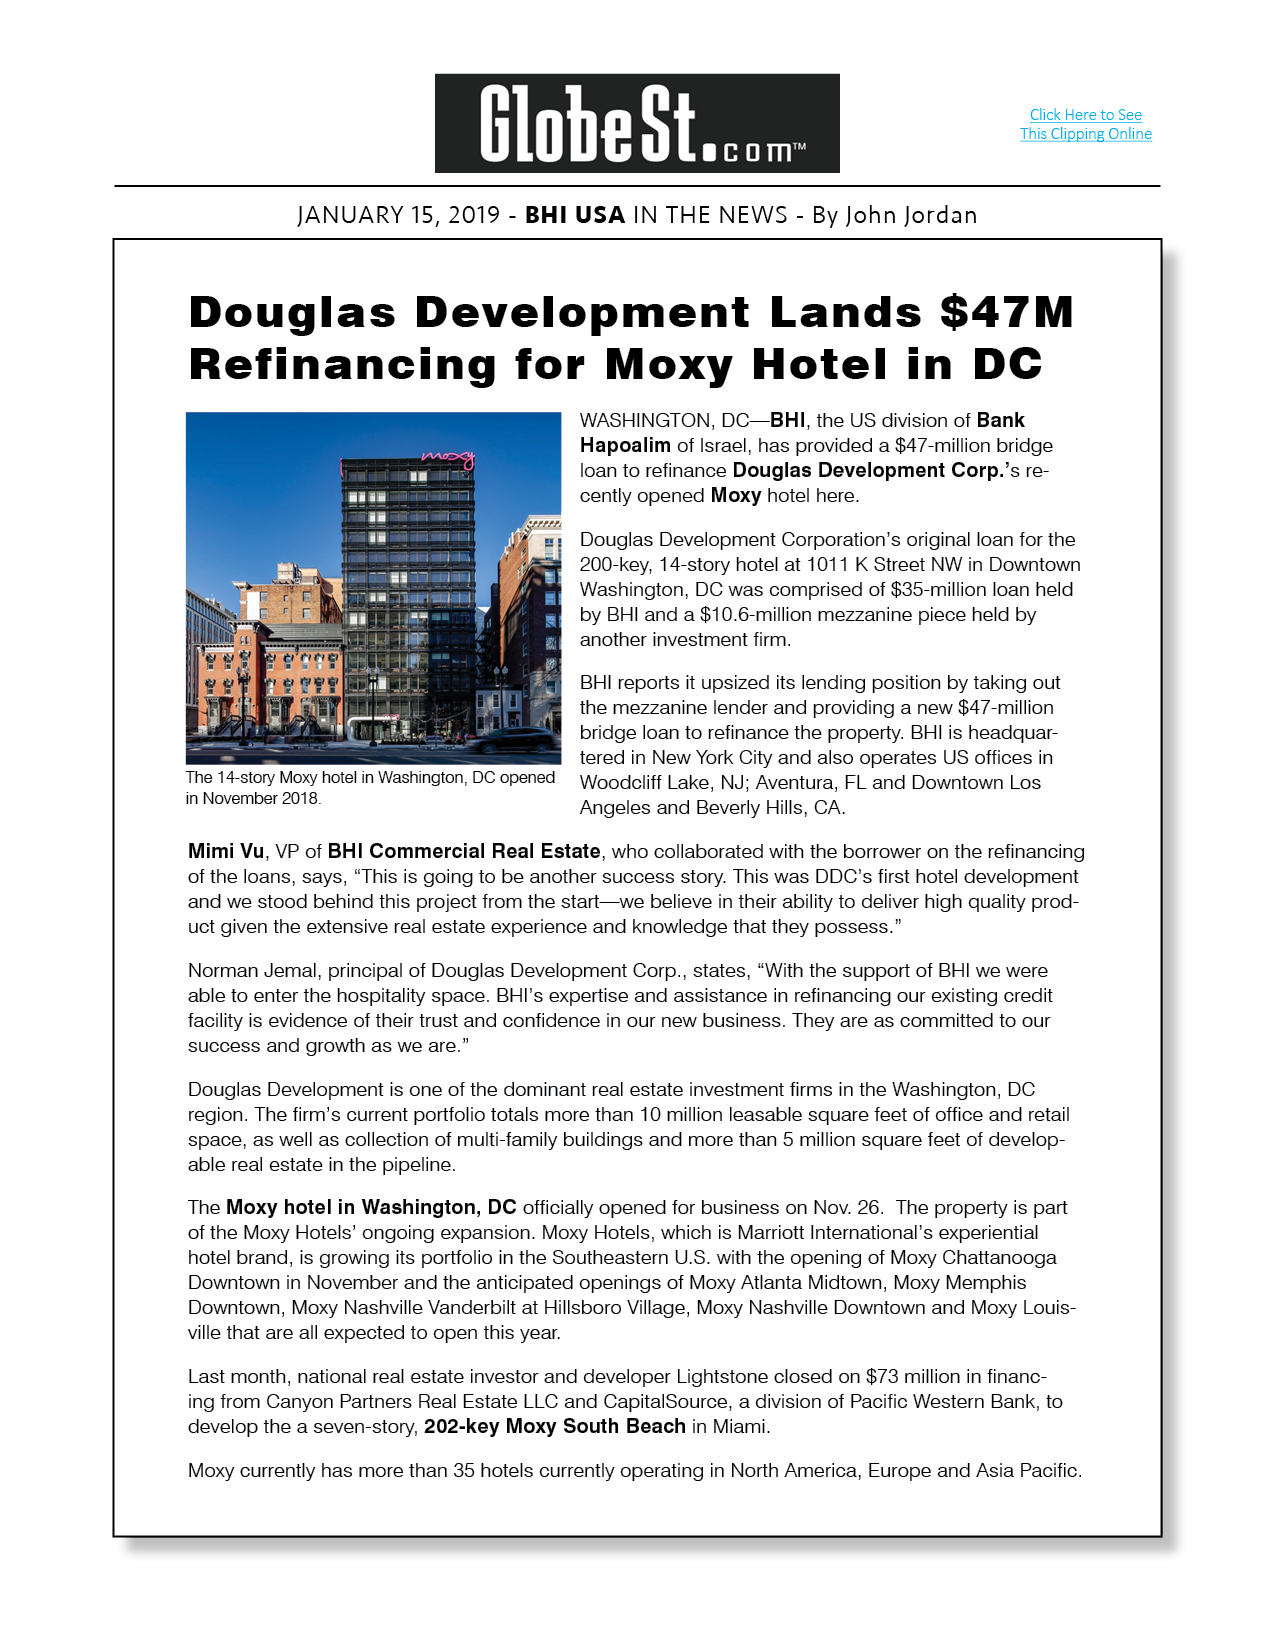 011519-GlobeST DC-OL-BHI-Douglas Develop